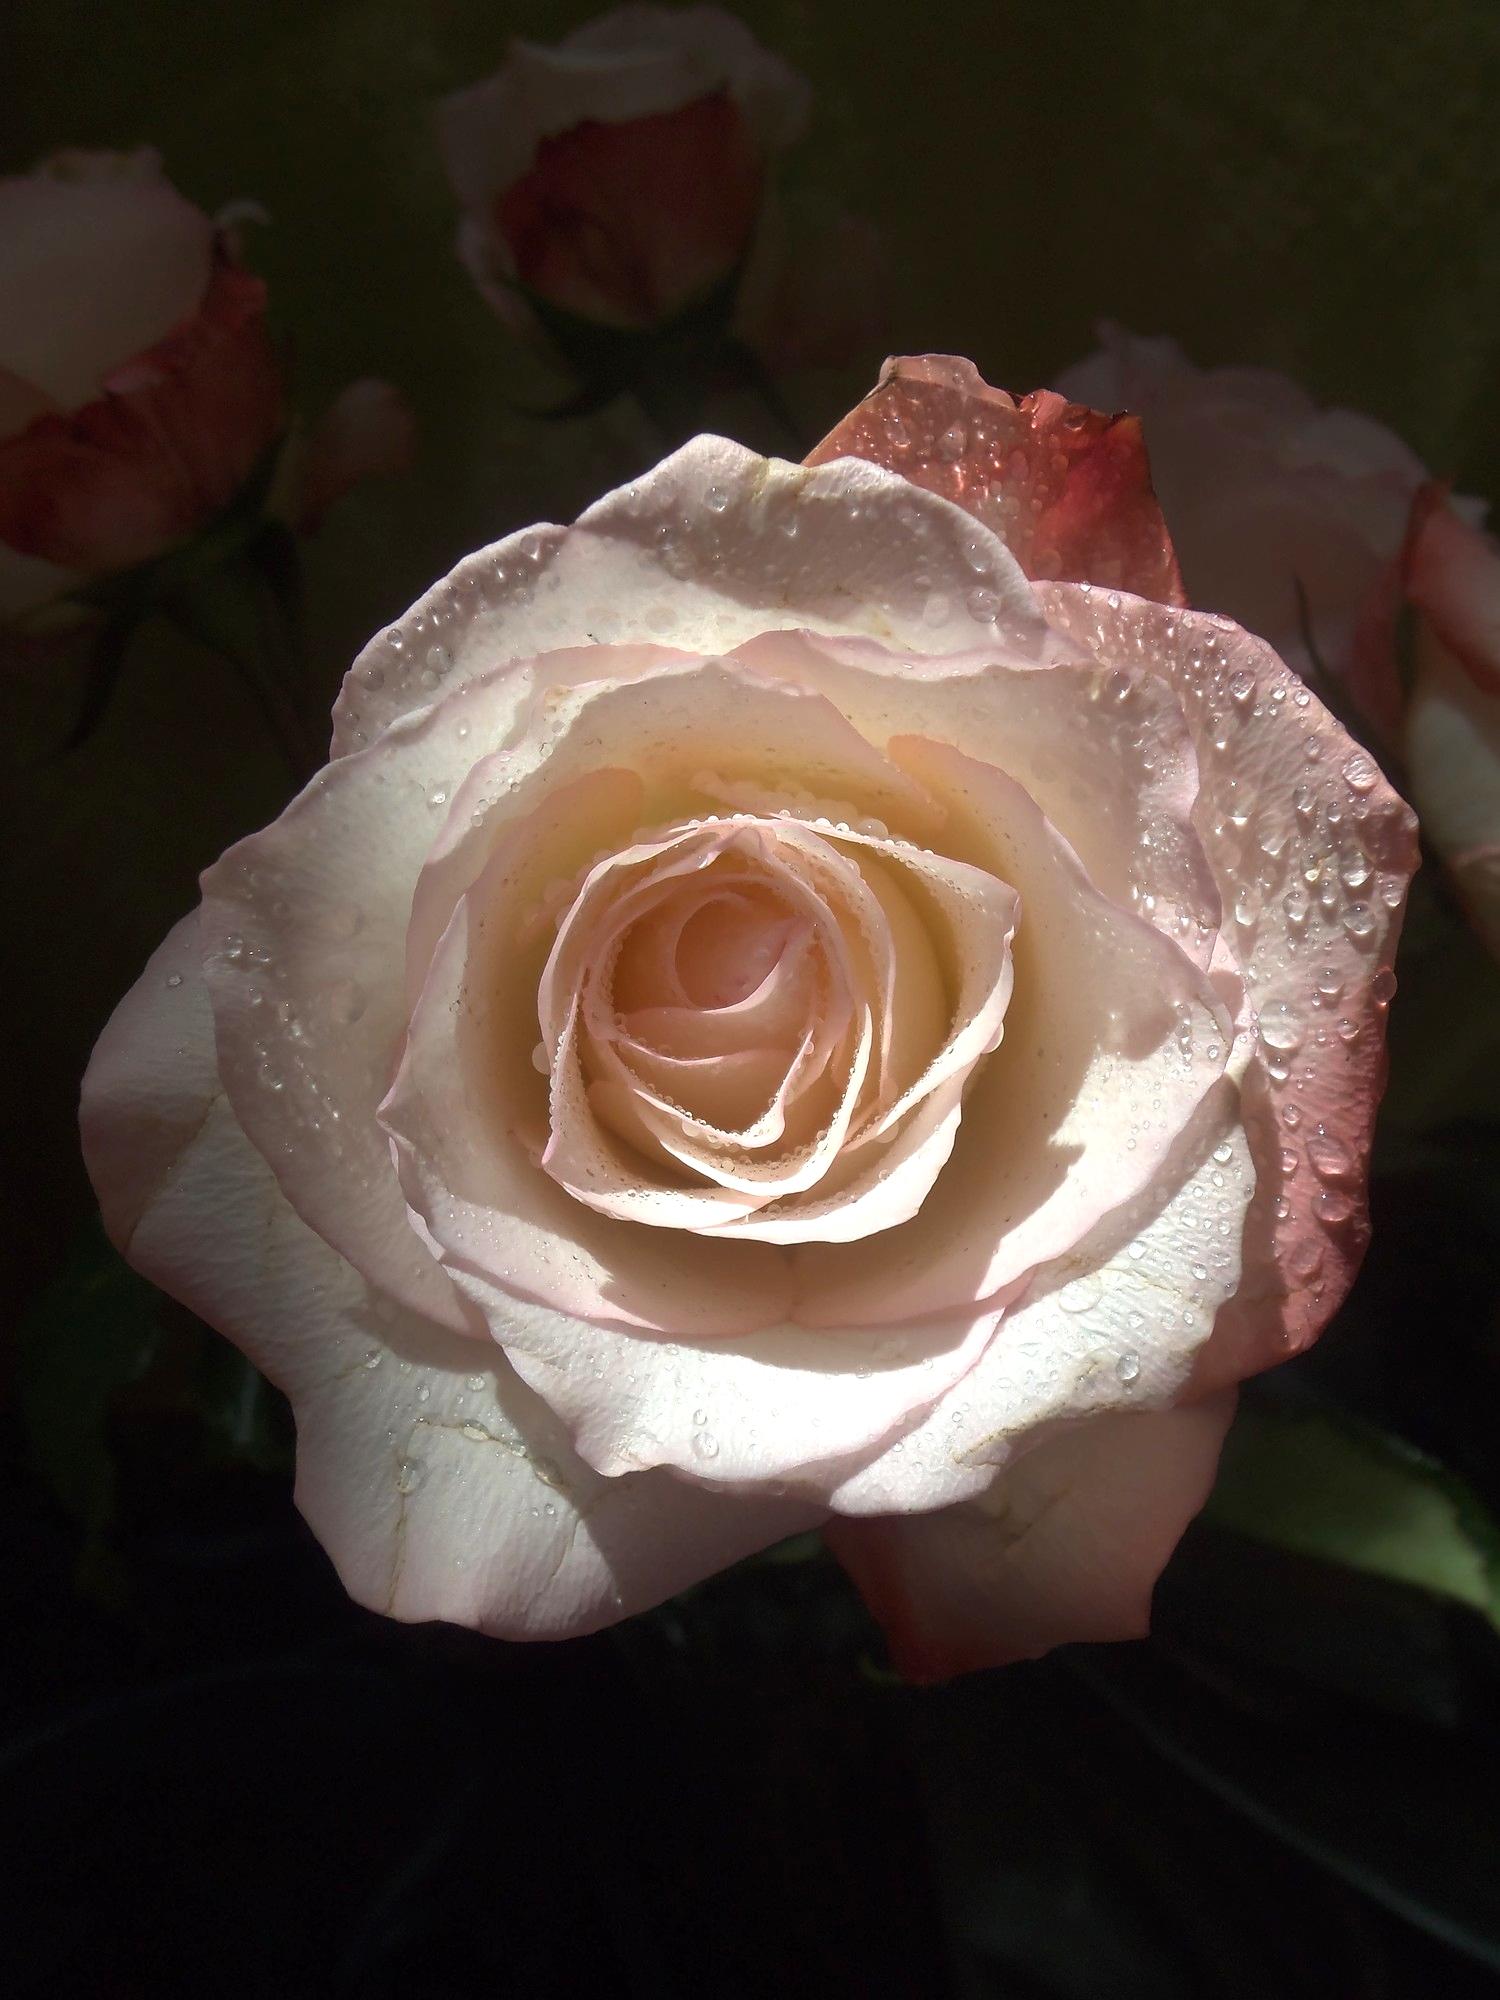 Roselight © Candy Paull